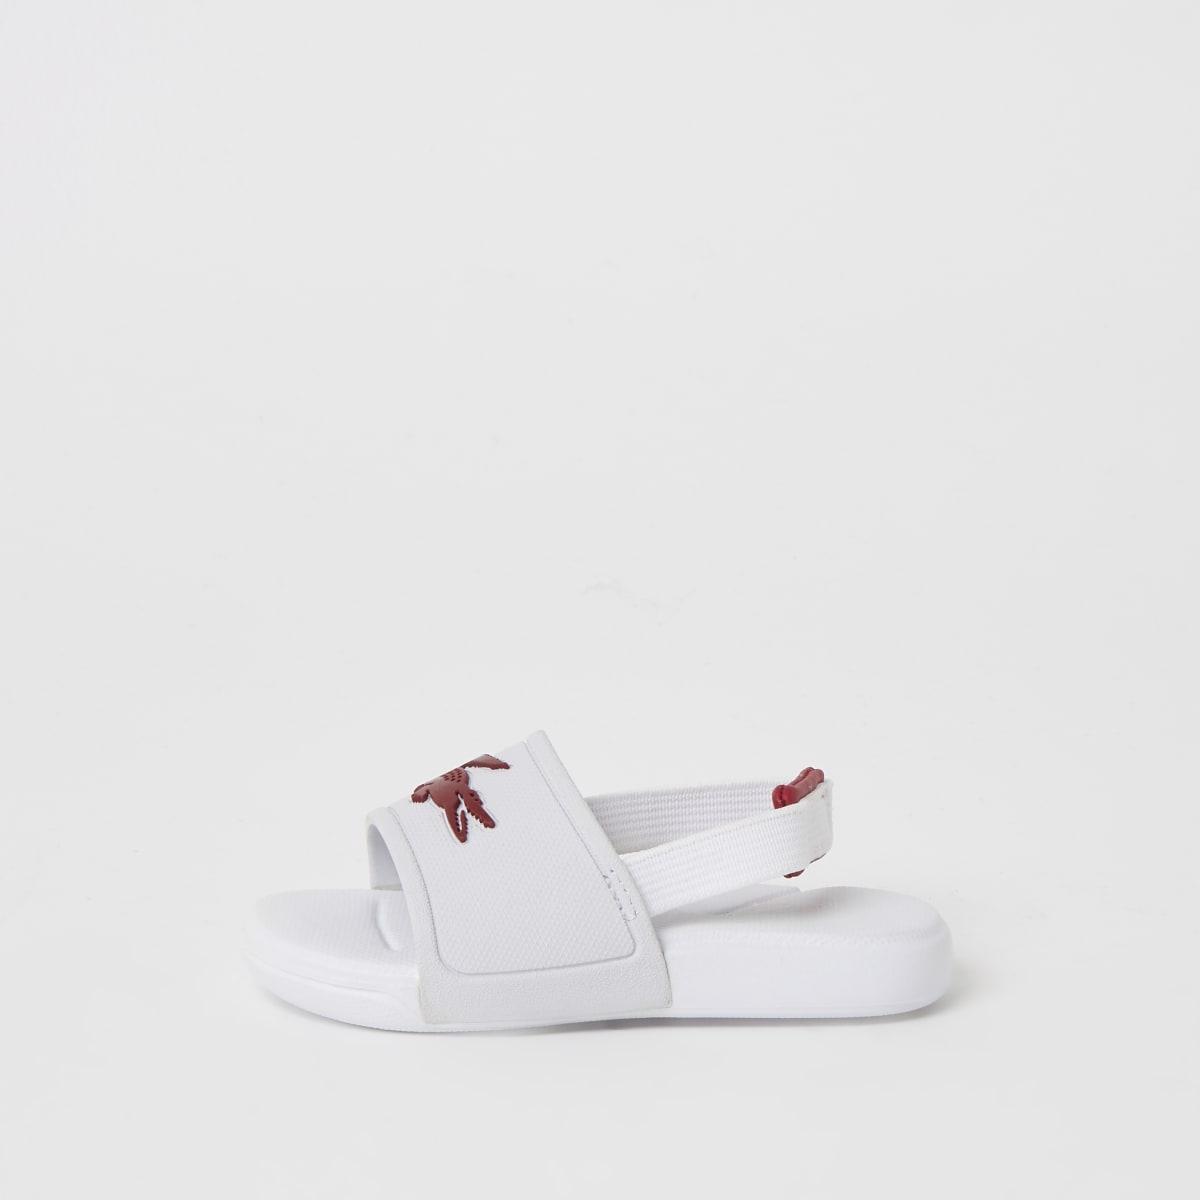 Lacoste - Witte slippers met logo voor mini-meisjes